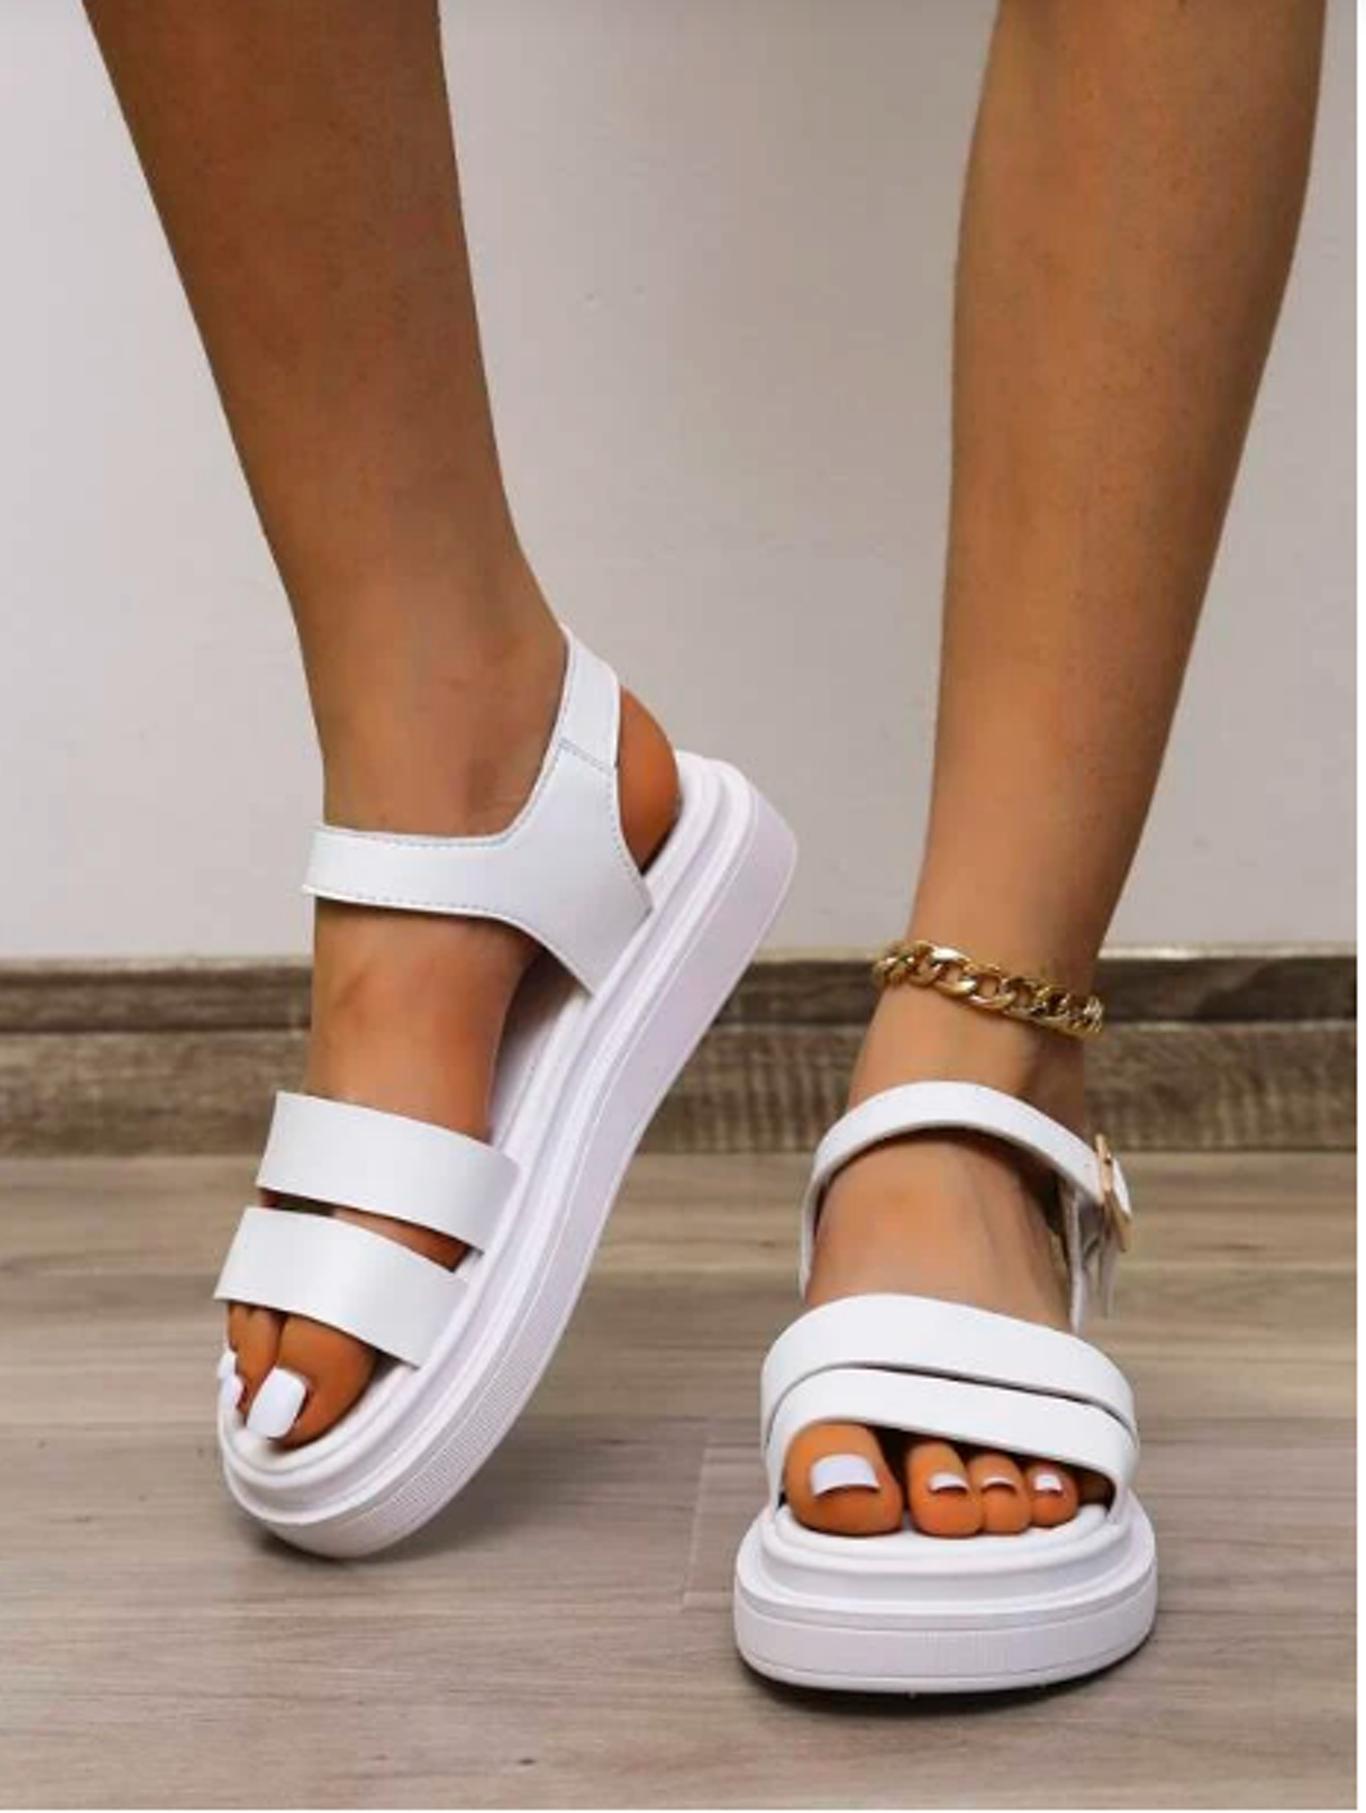 Sandalias de plataforma plana minimalista con diseño de hebilla